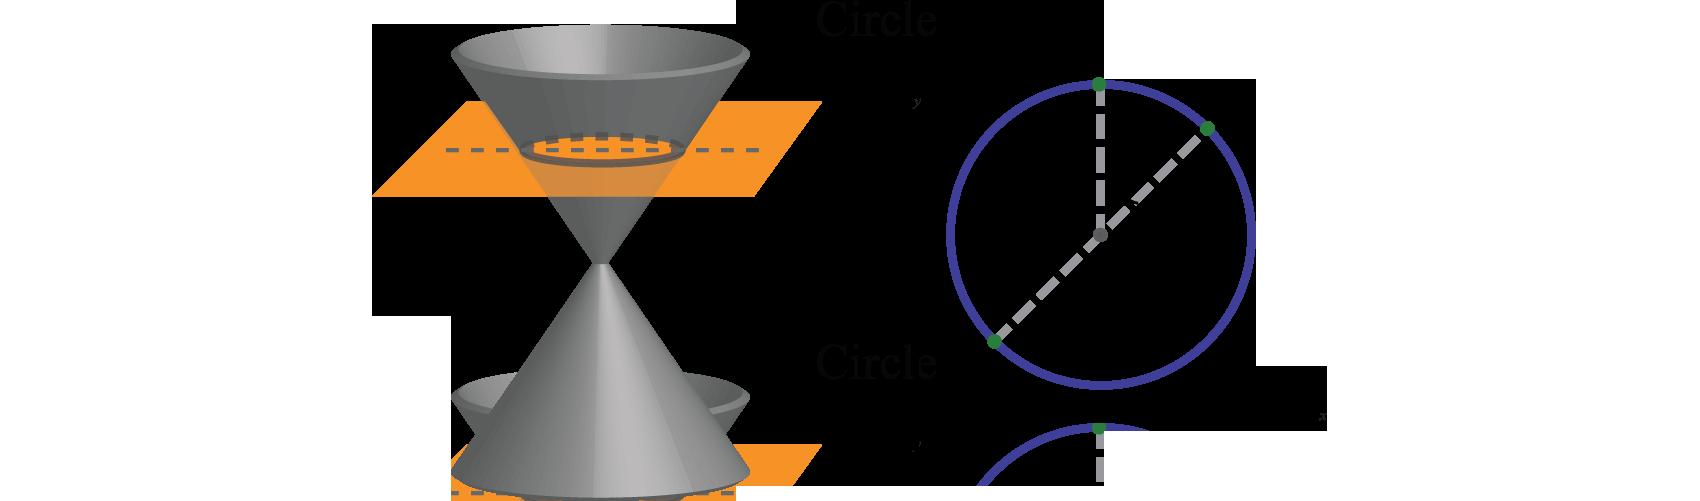 82 circles mathematics libretexts the circle in standard form falaconquin